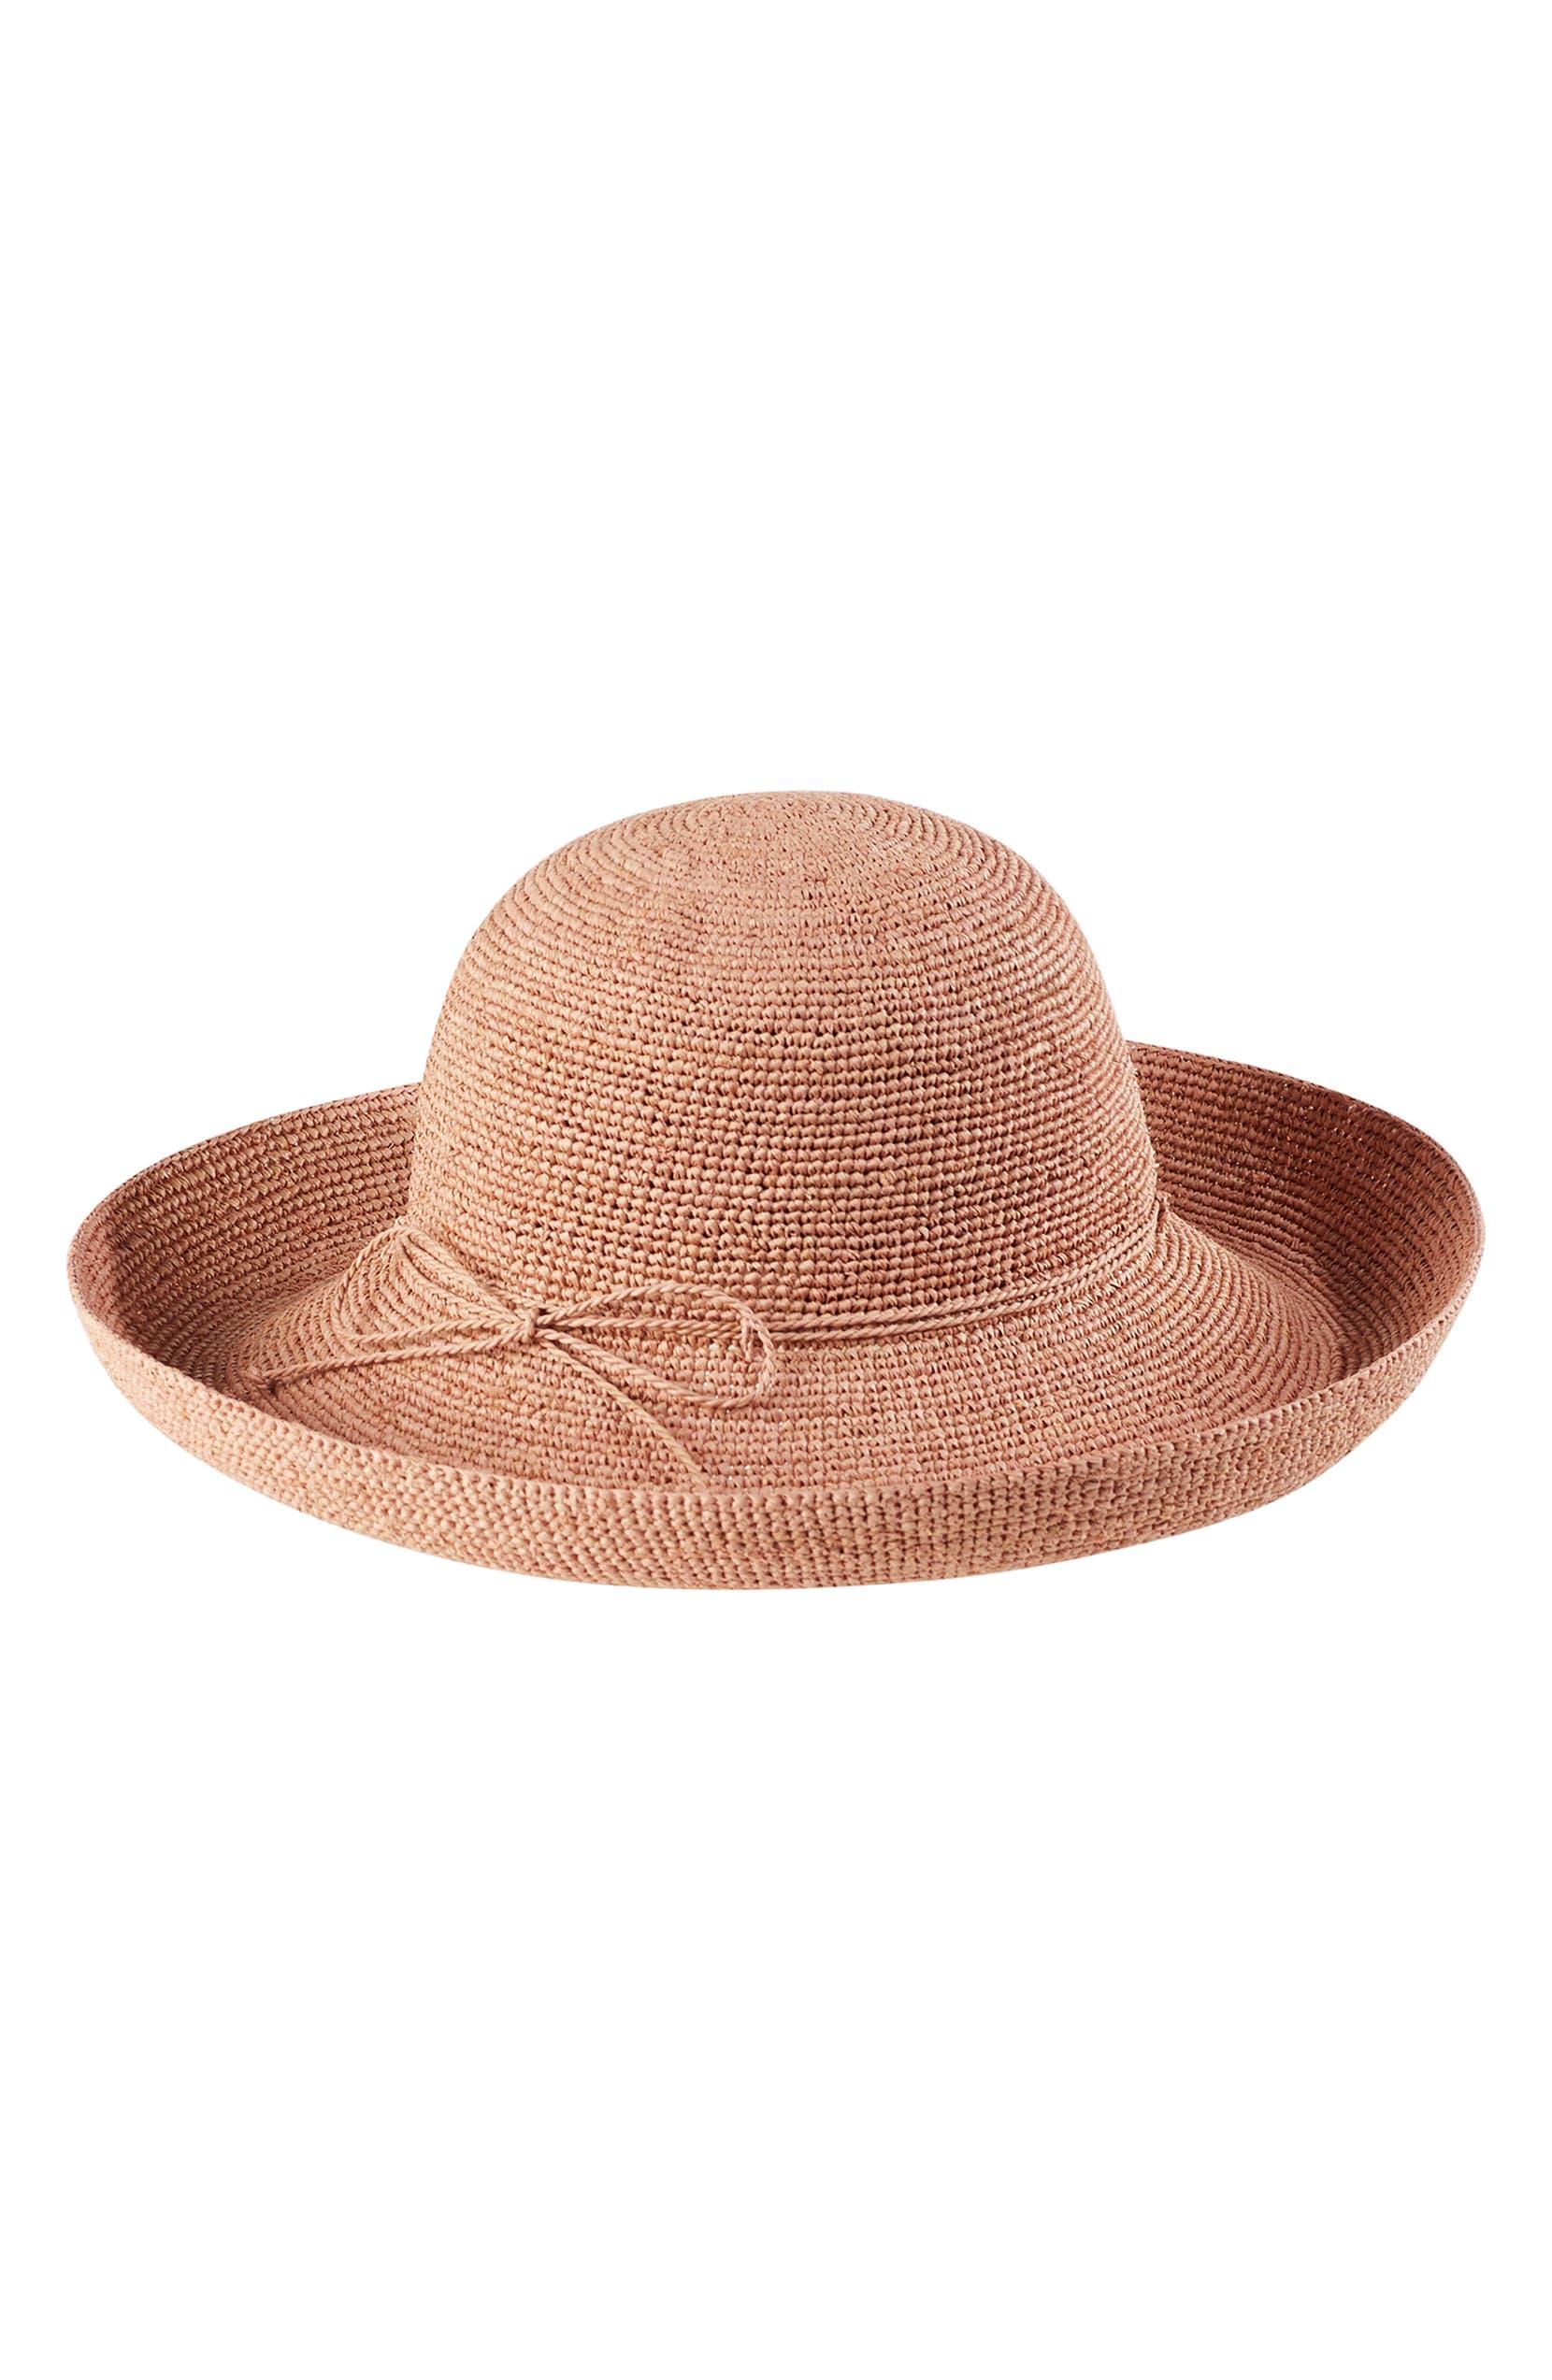 3026f57edf6b6e Helen Kaminski 'Provence 12' Packable Raffia Hat | Nordstrom